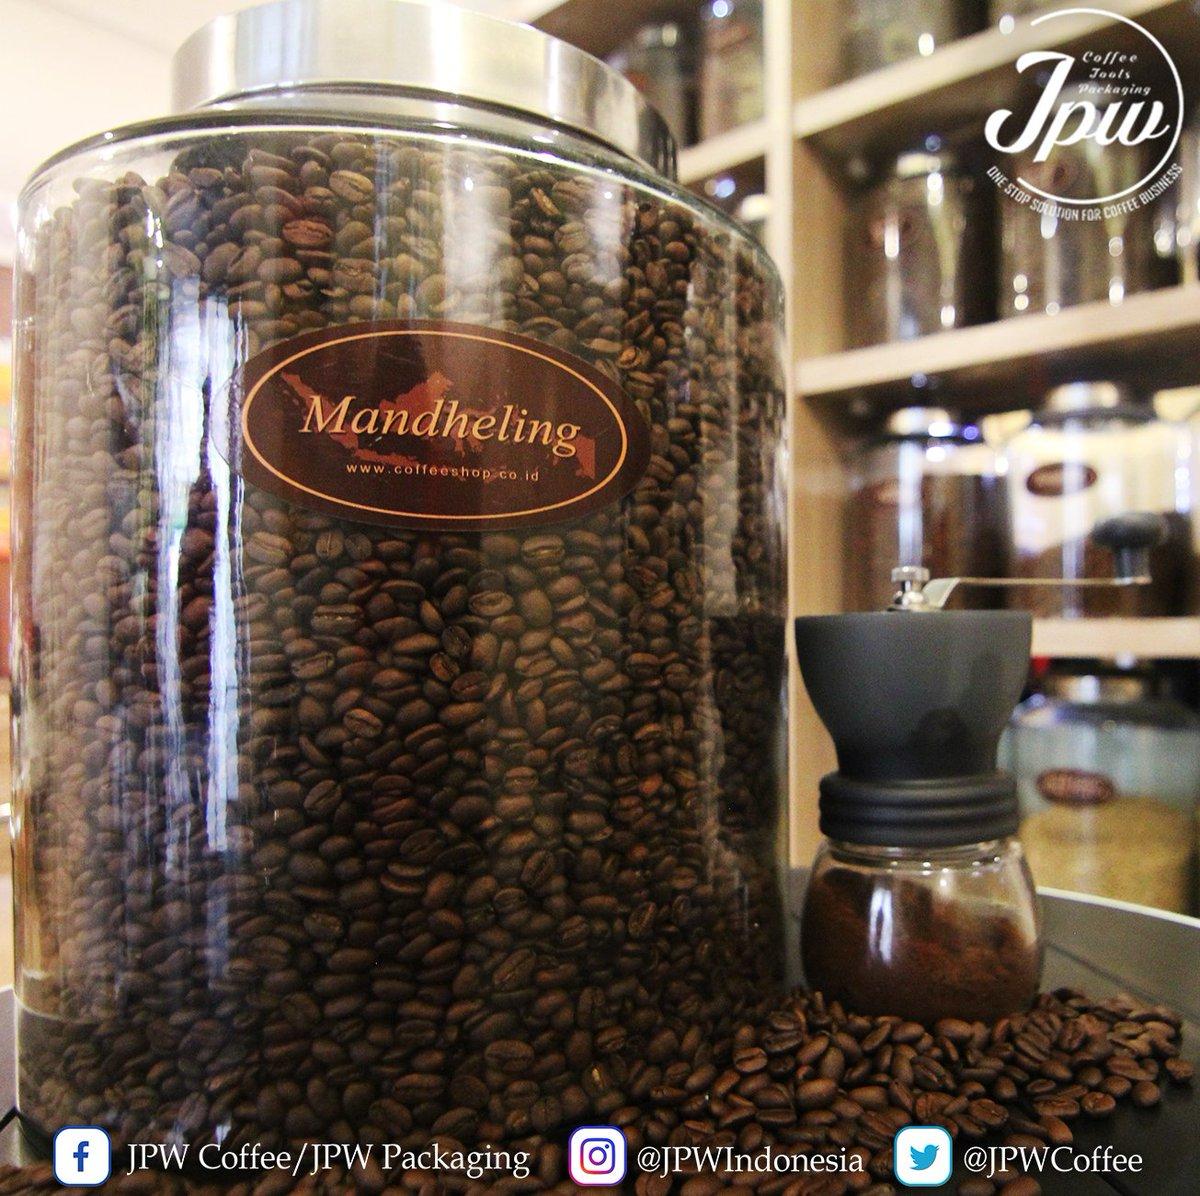 Jpw Coffee Kopi Aceh Gayo Honey Process 250g Bubuk Specialty Grade Arabika Lanang Peaberry 250gr Biji Atau Tagetto Hot Promo Papua Wamena 500g Cof Source 0